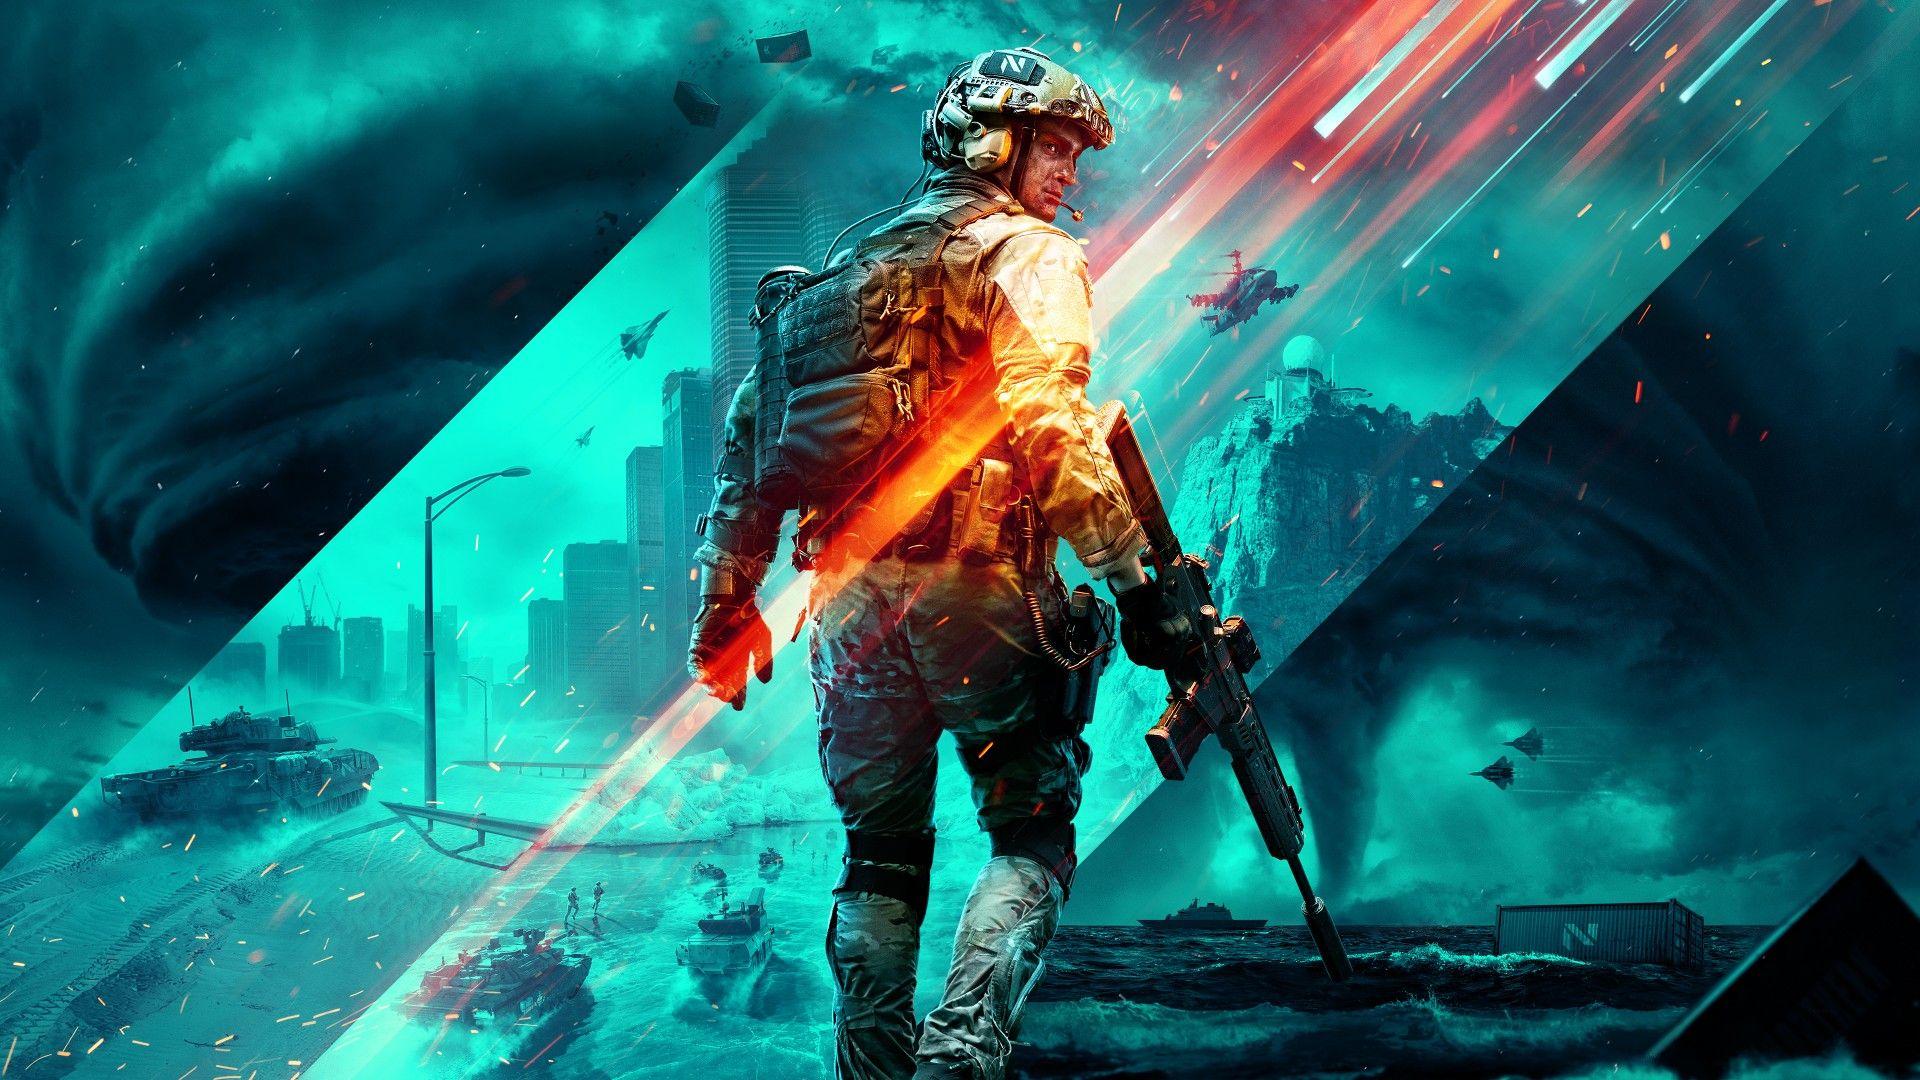 Battlefield 2042 Key Art Screenshots and Specialist System Leak 1920x1080